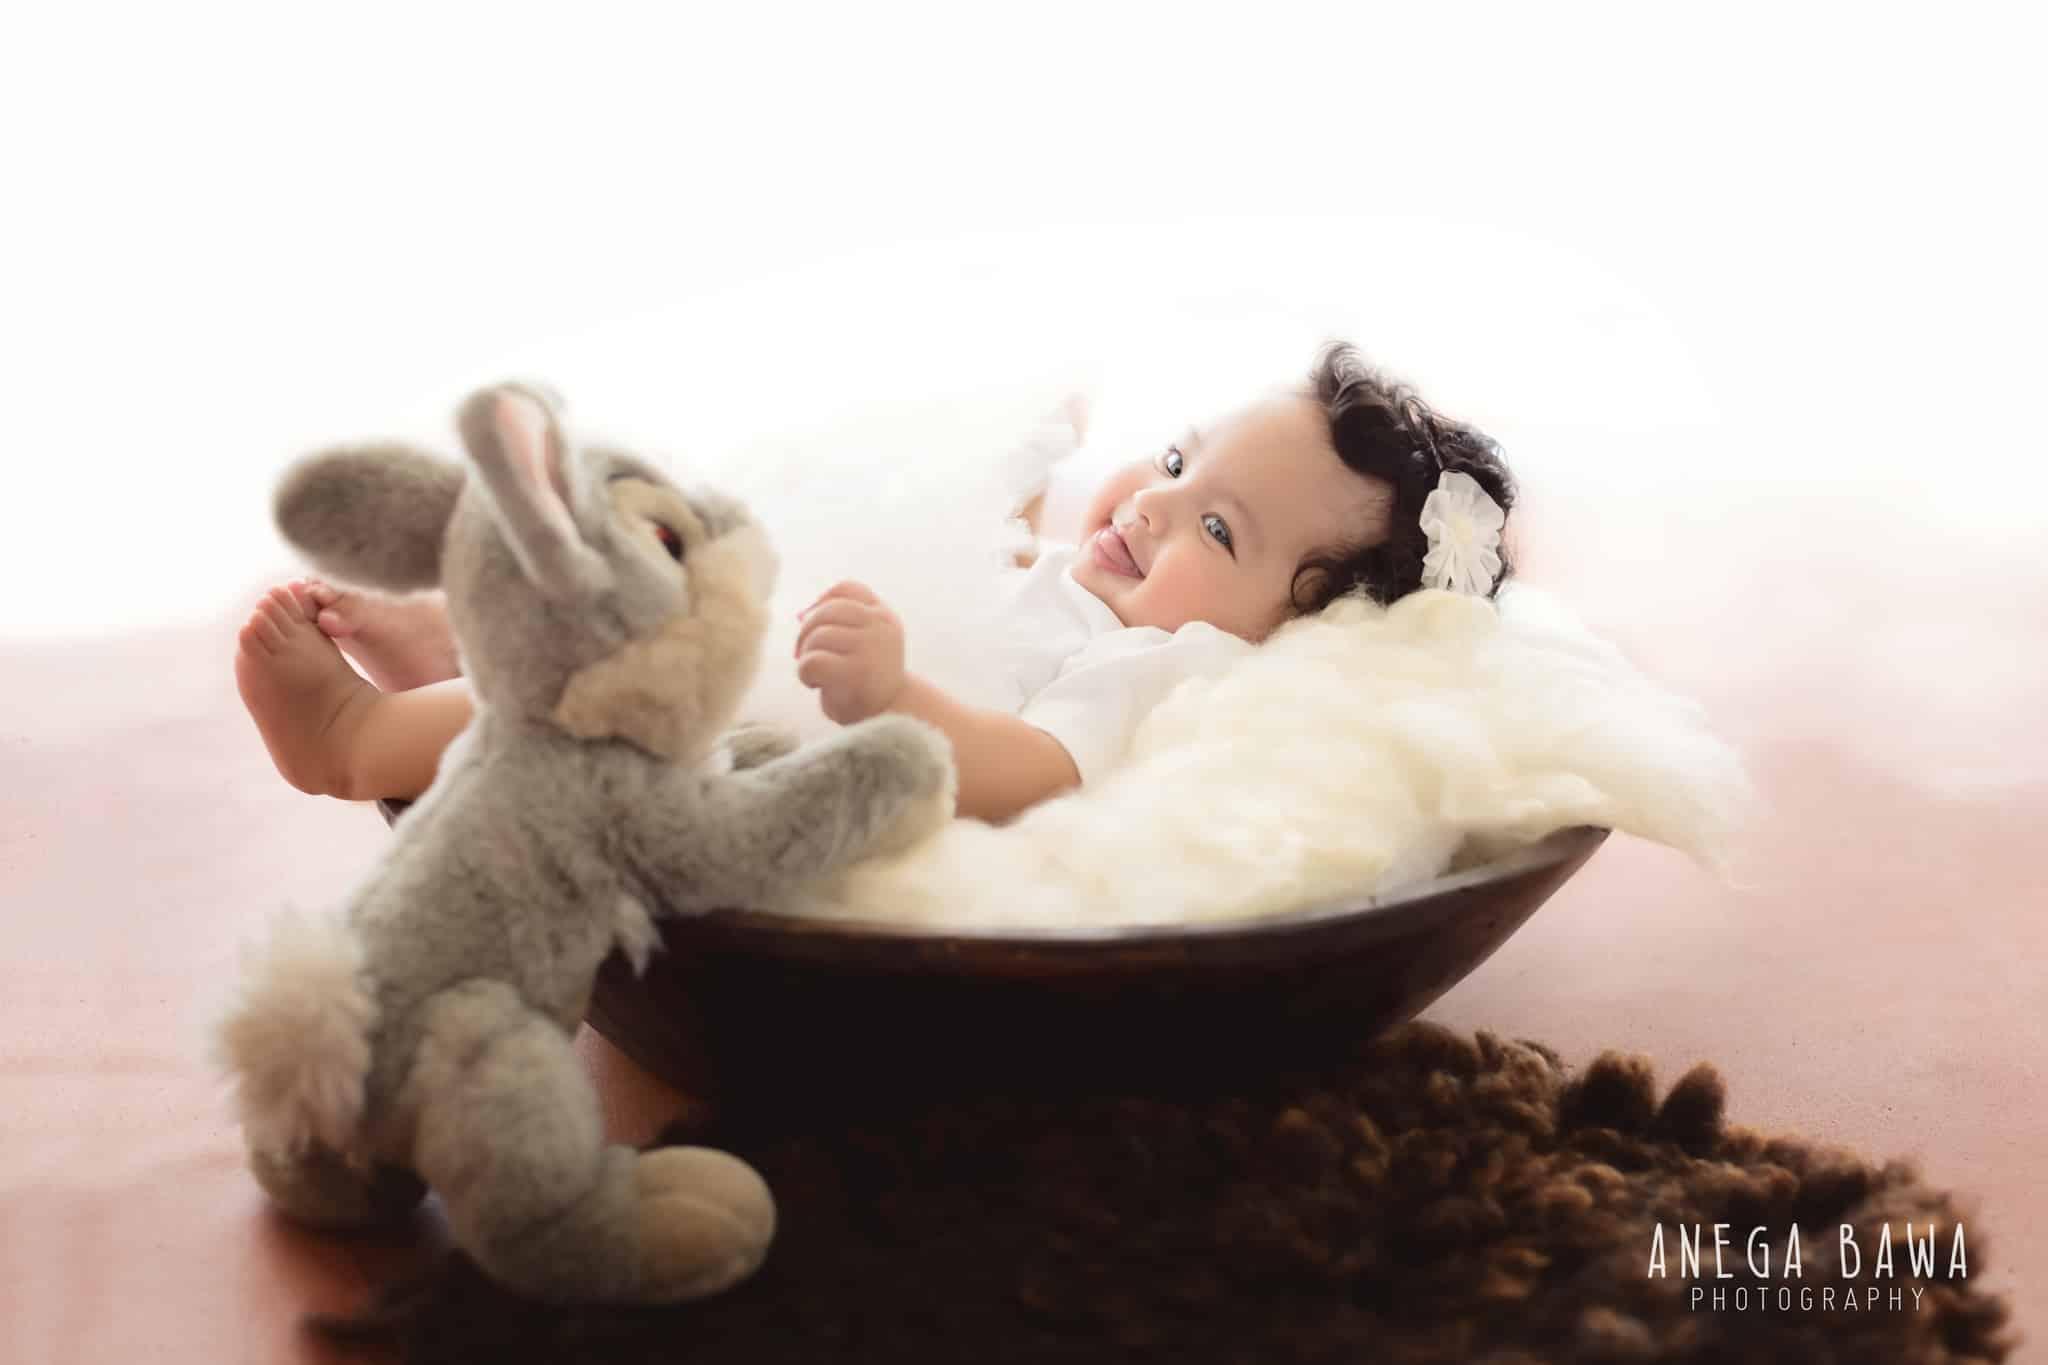 007_baby_photography_delhi_gurgaon_noida_anega_bawa_photography